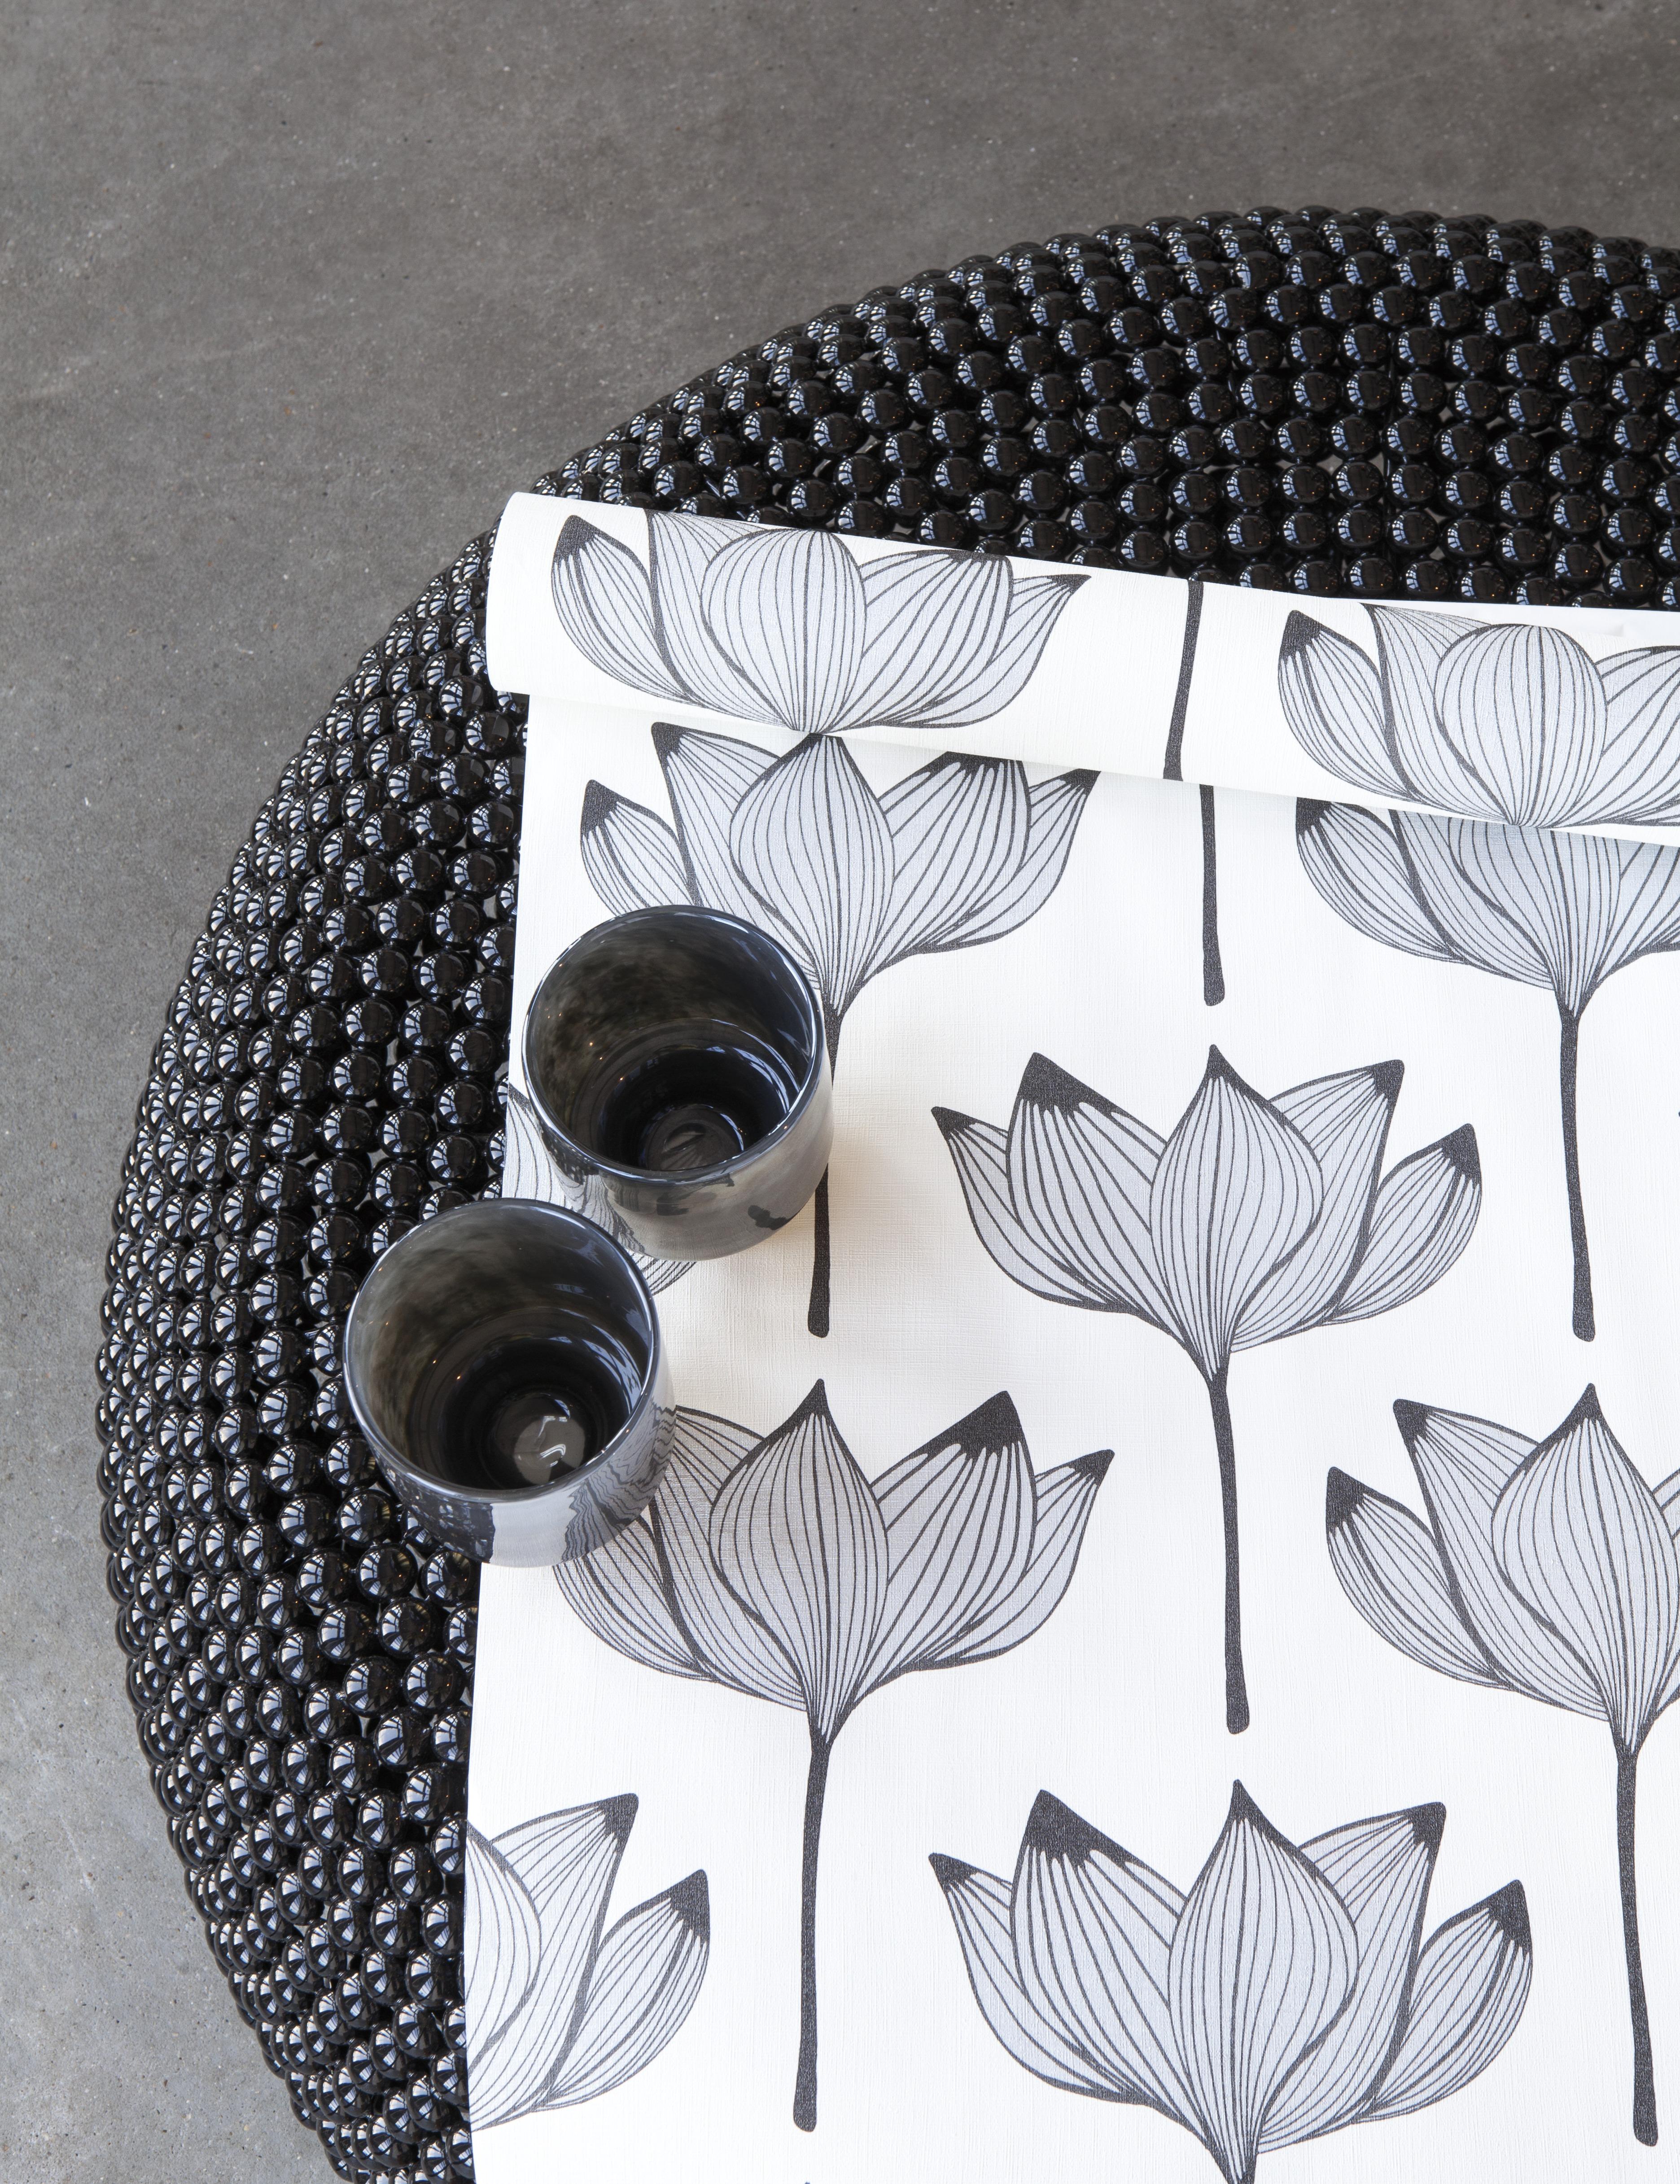 Virágmintás tapéta minimalista skandináv stílusban